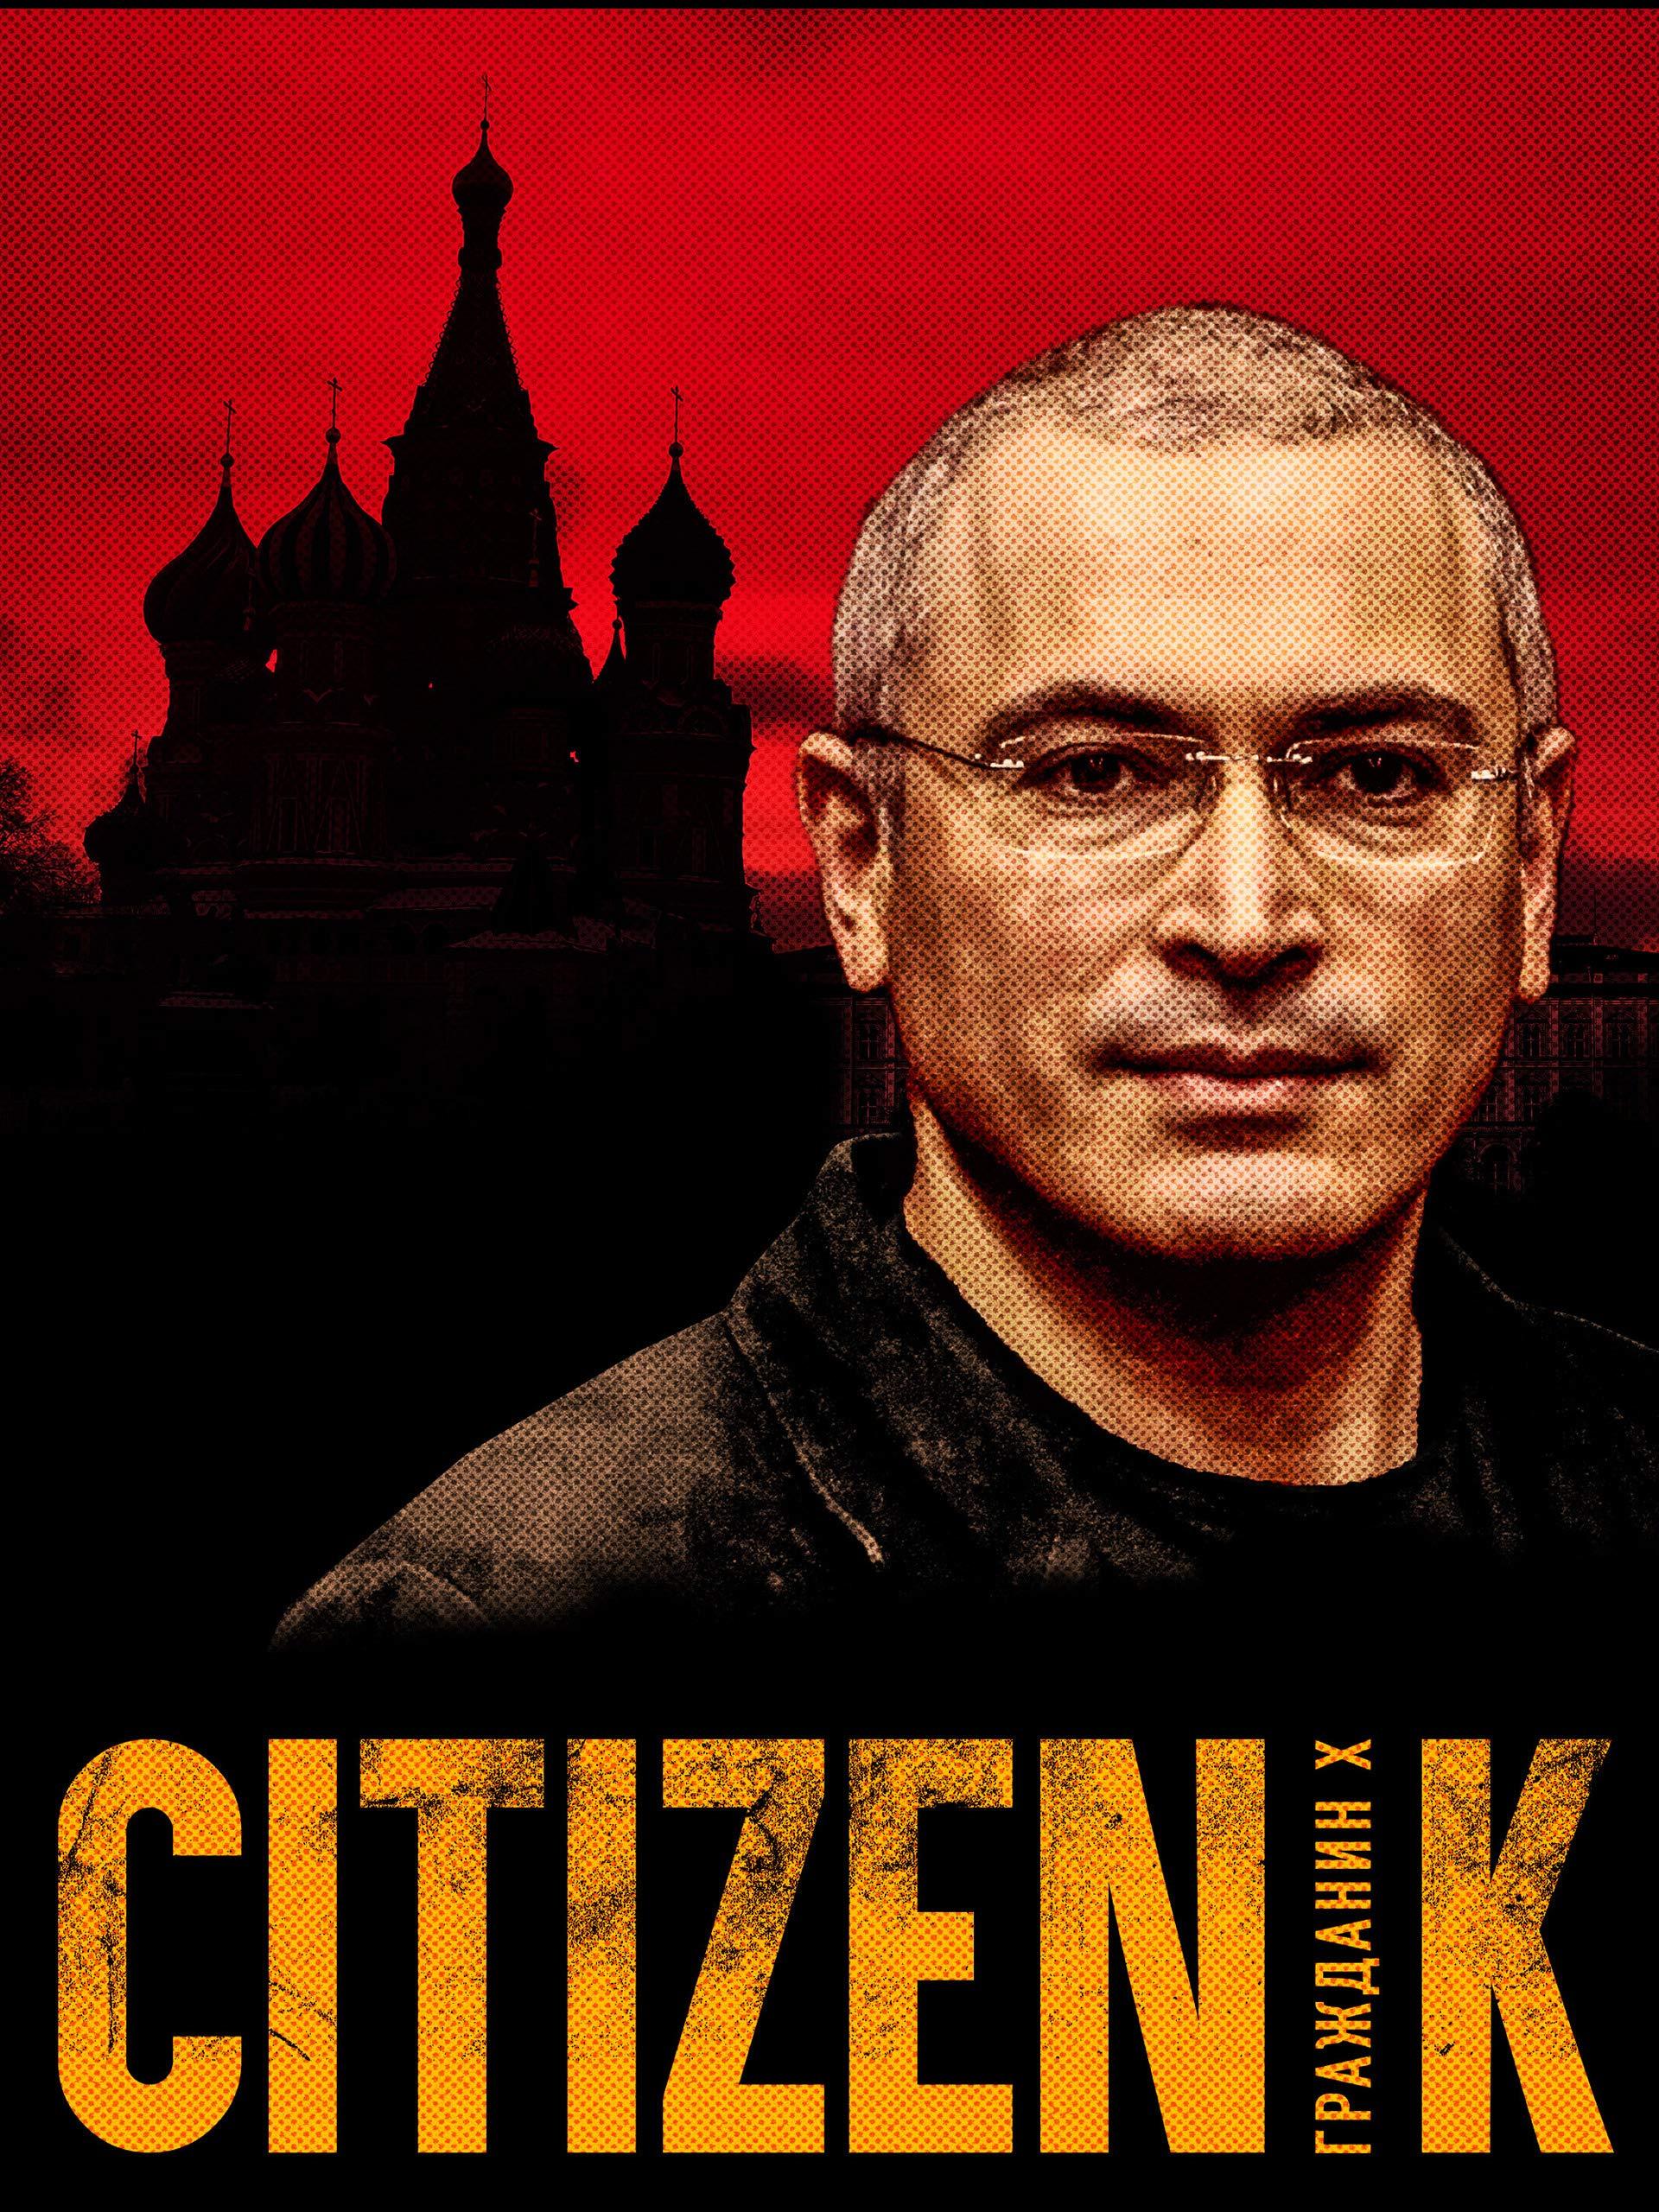 Citizen-K